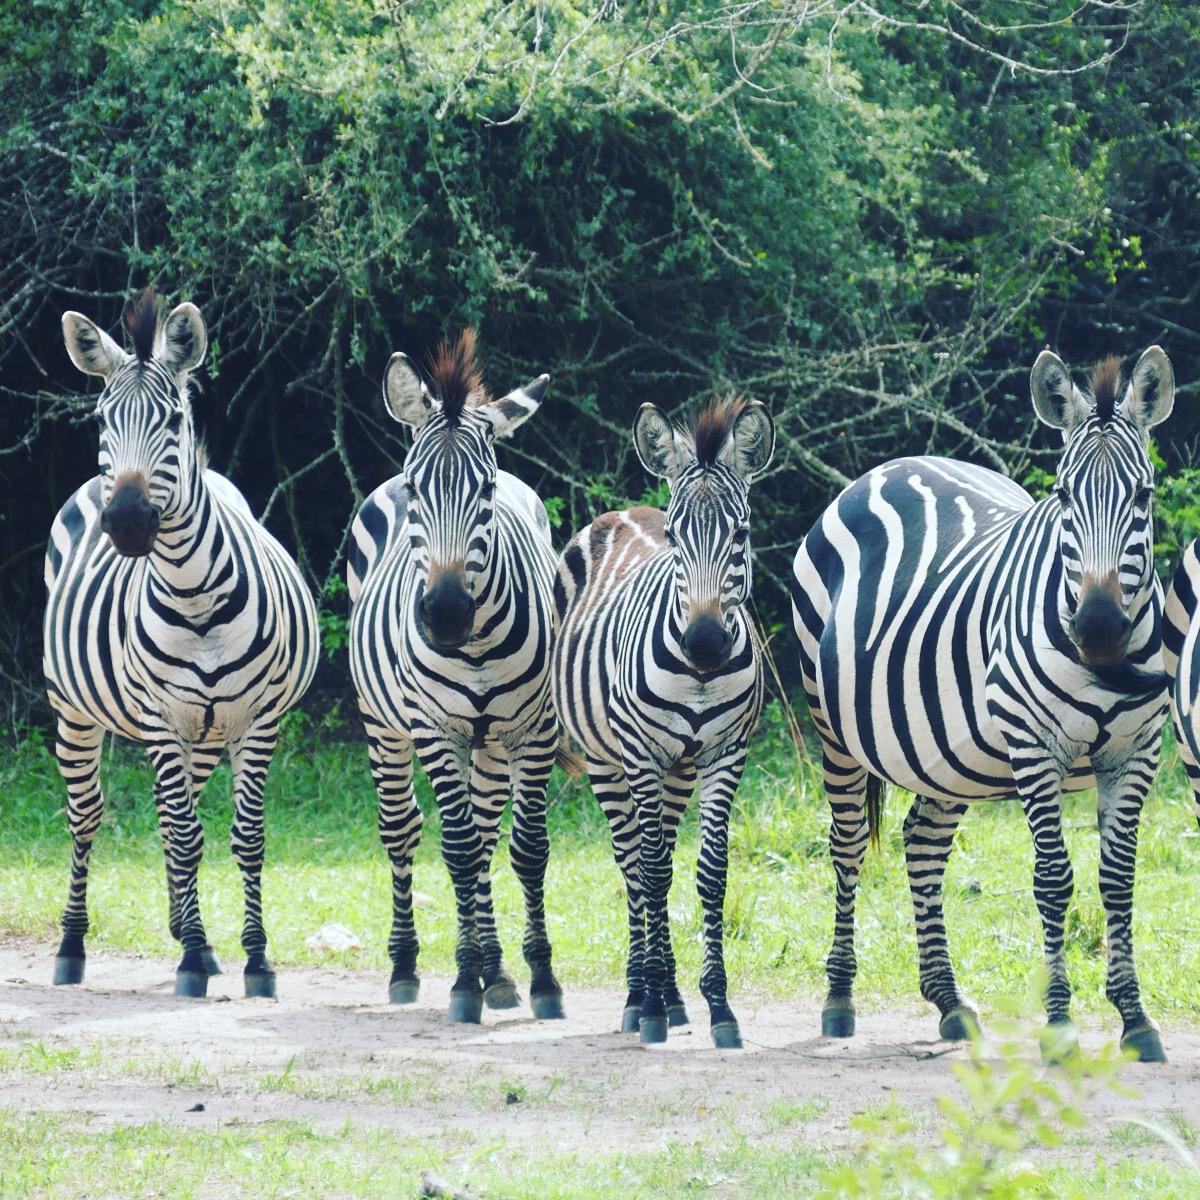 Zebras line up at Lake Mburo. Noah Strycker